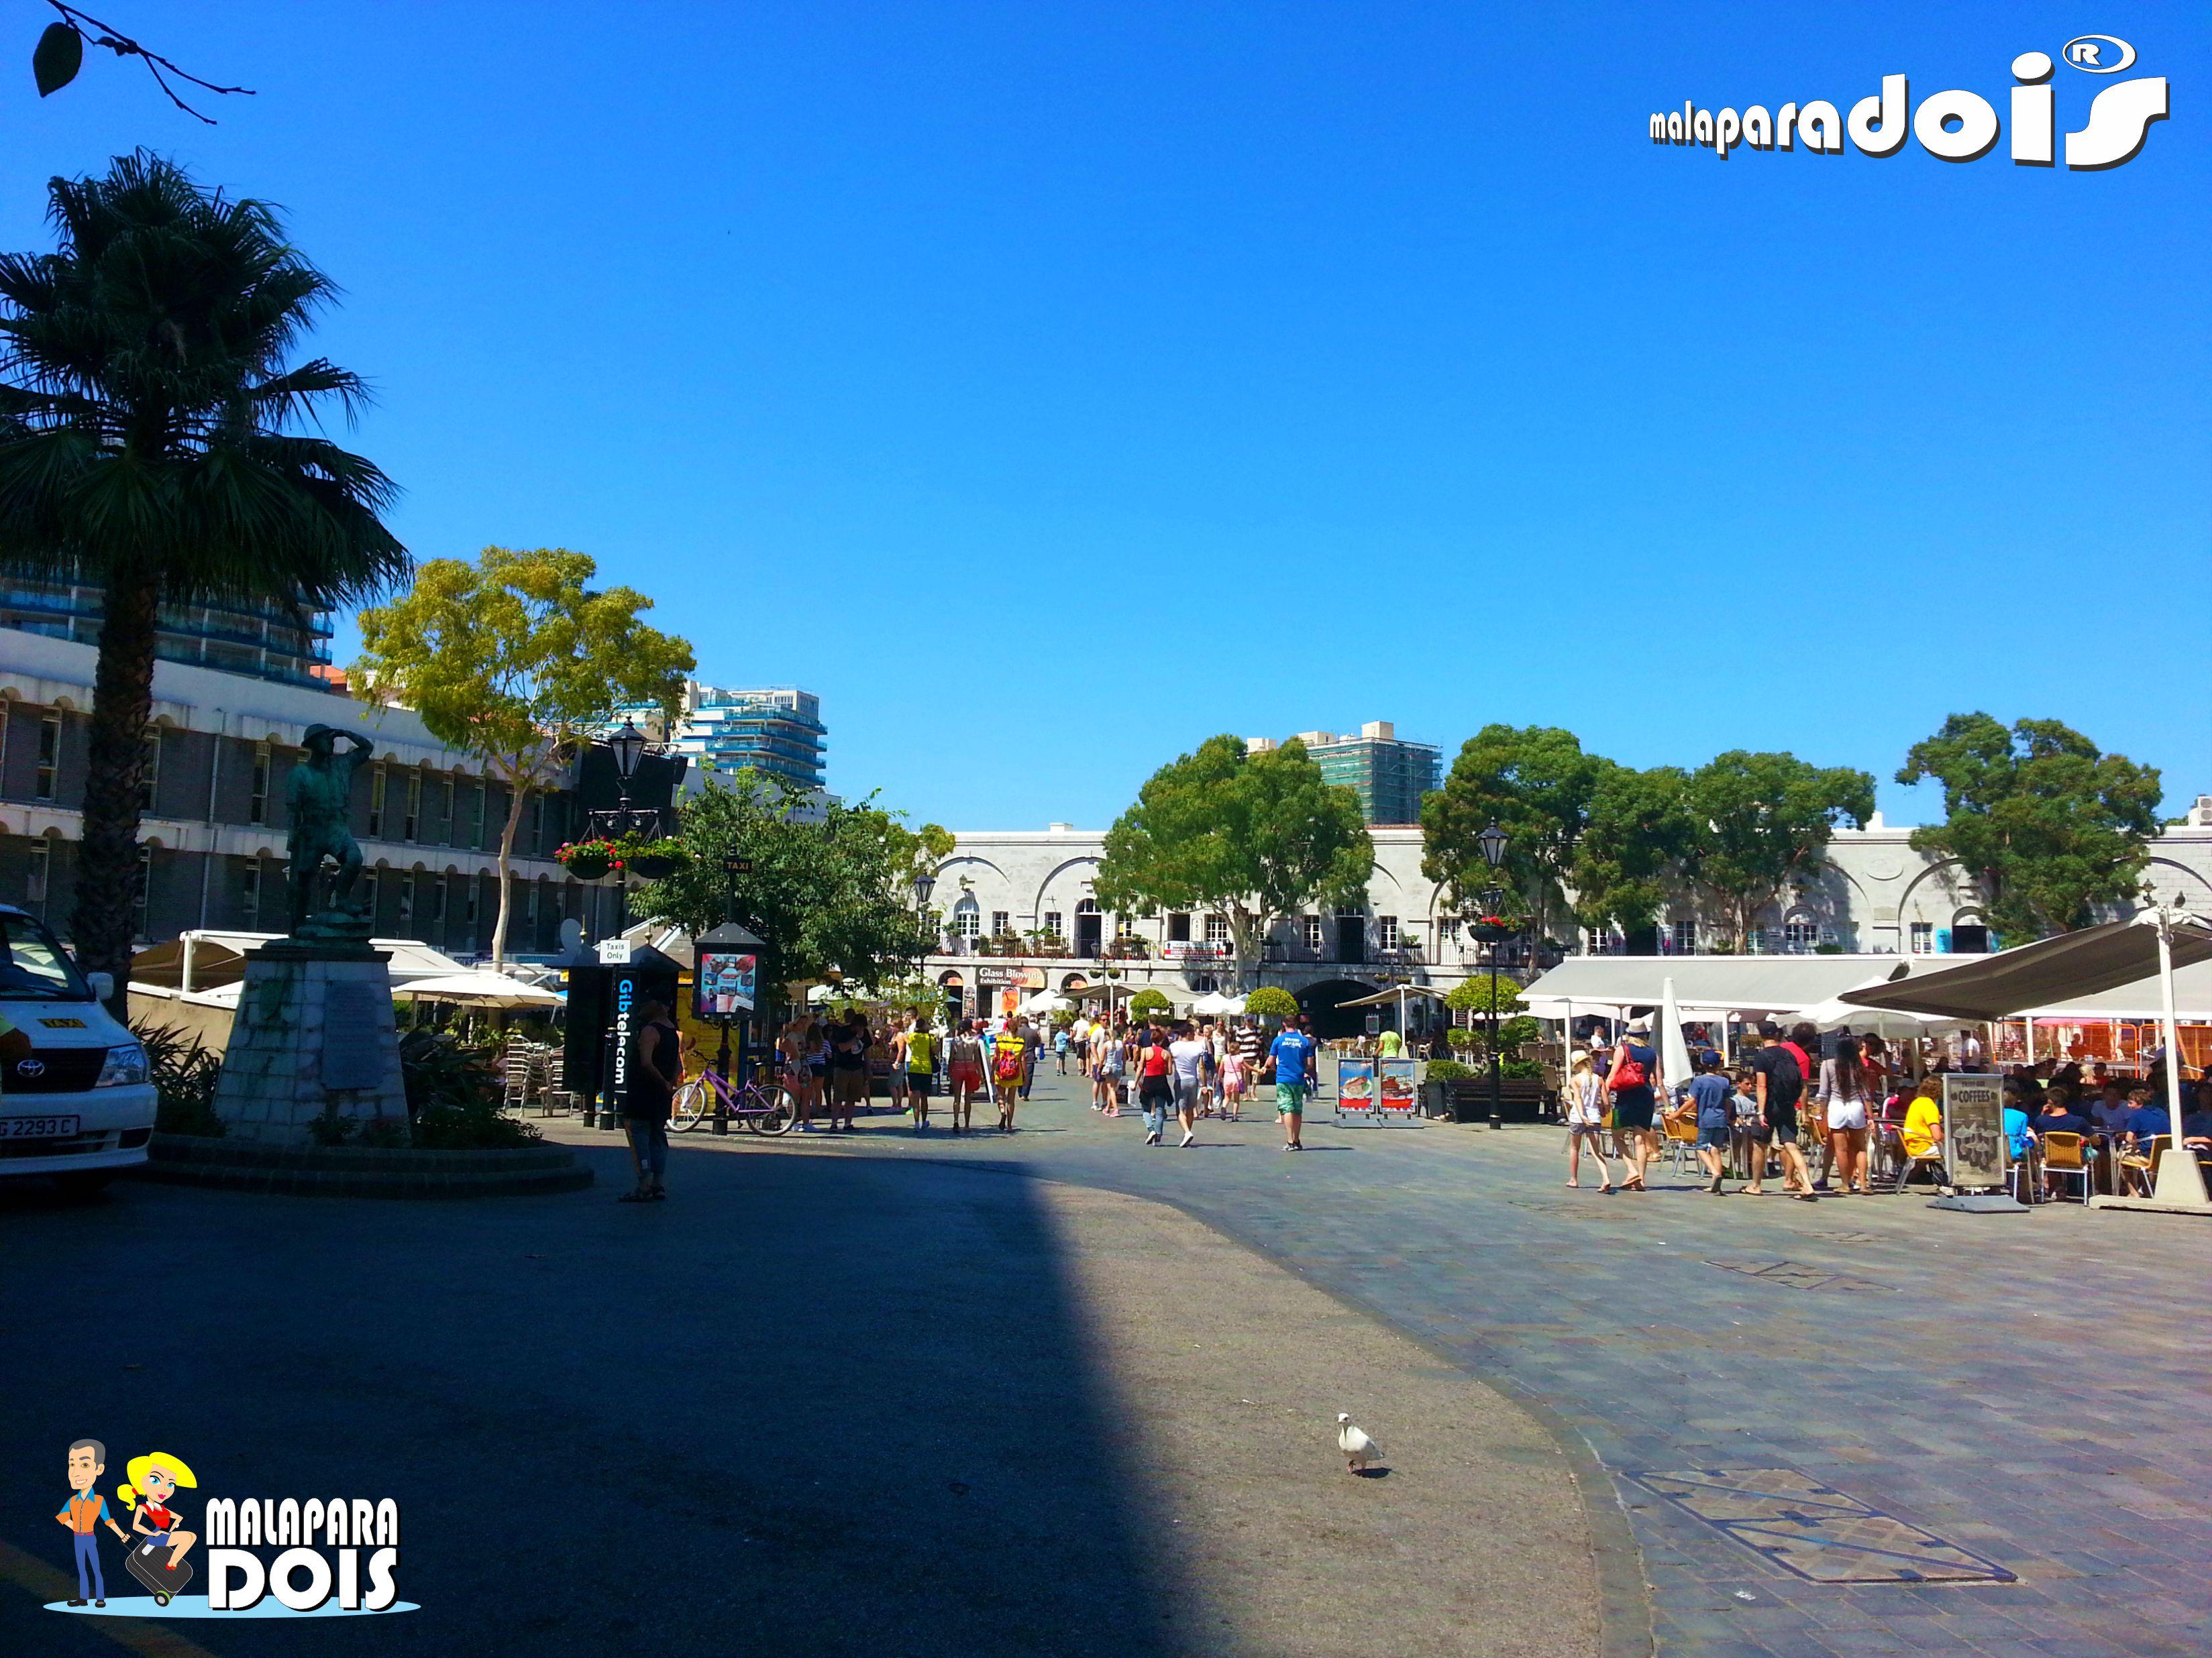 Casamates Square